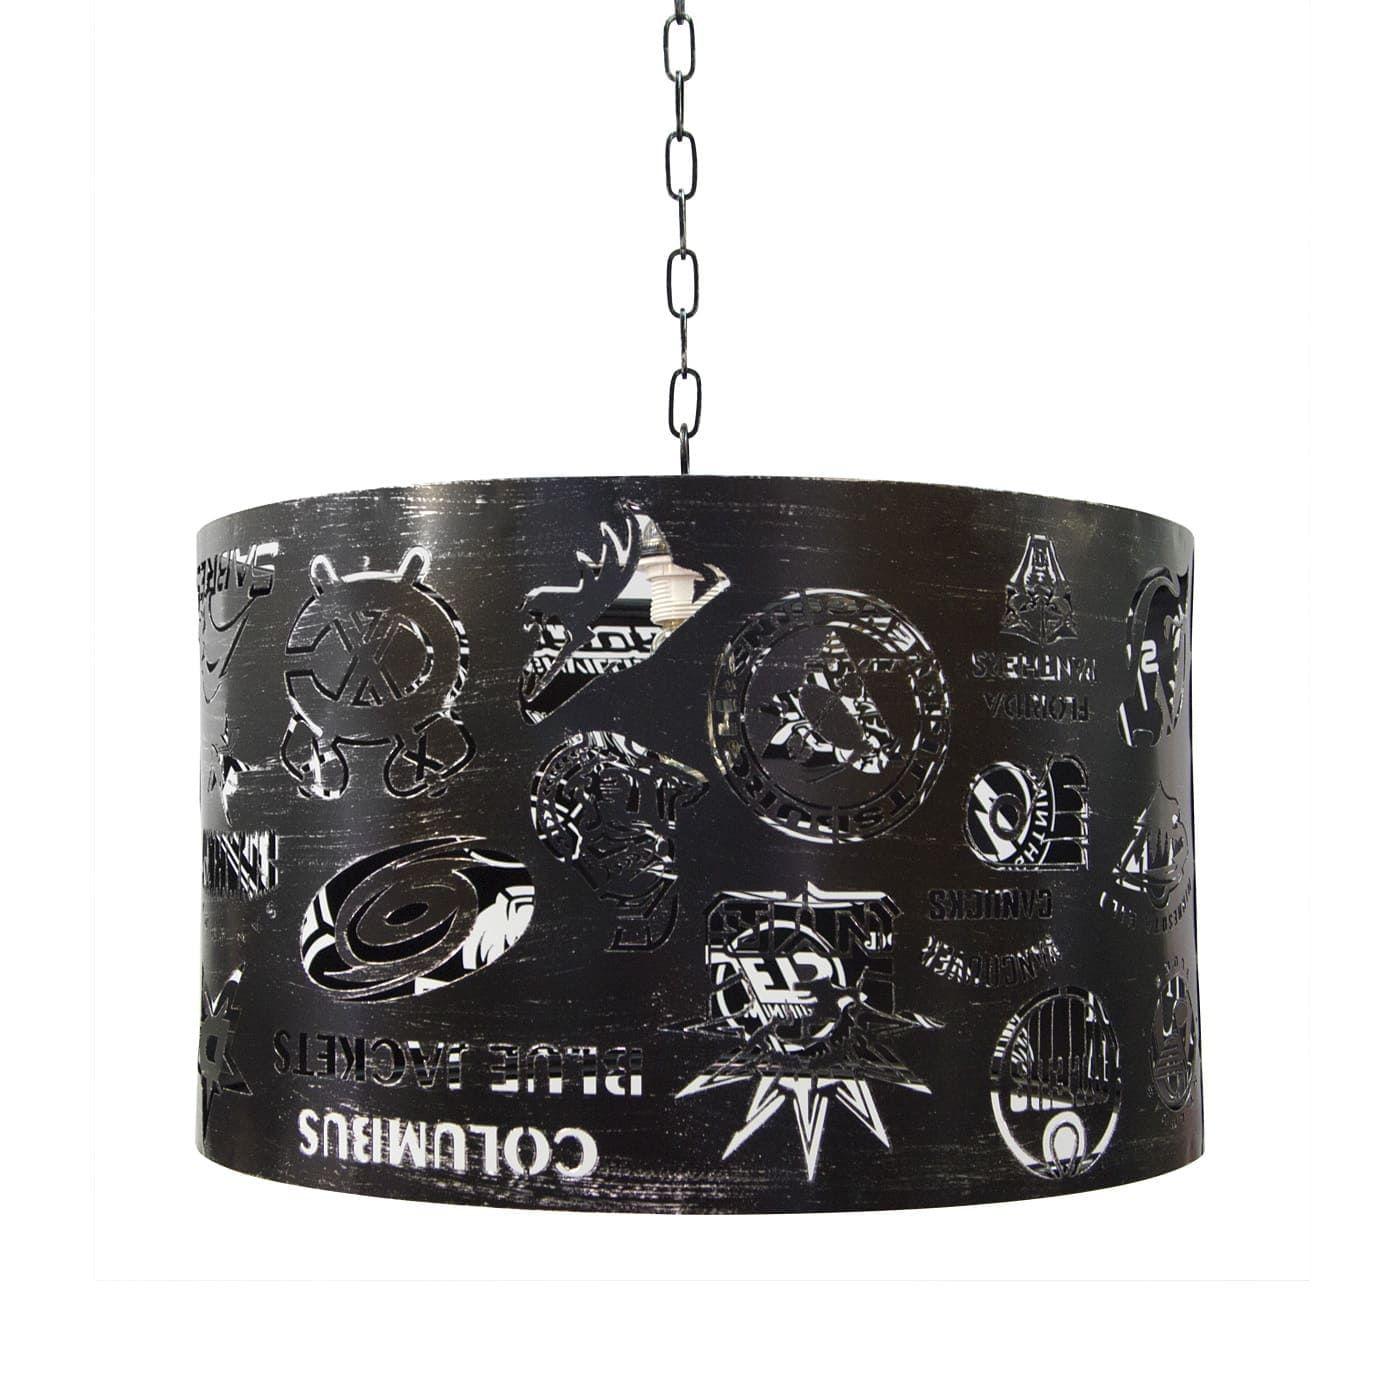 PETRASVET / Pendant chandelier S3121-1, 1xE27 max. 60W